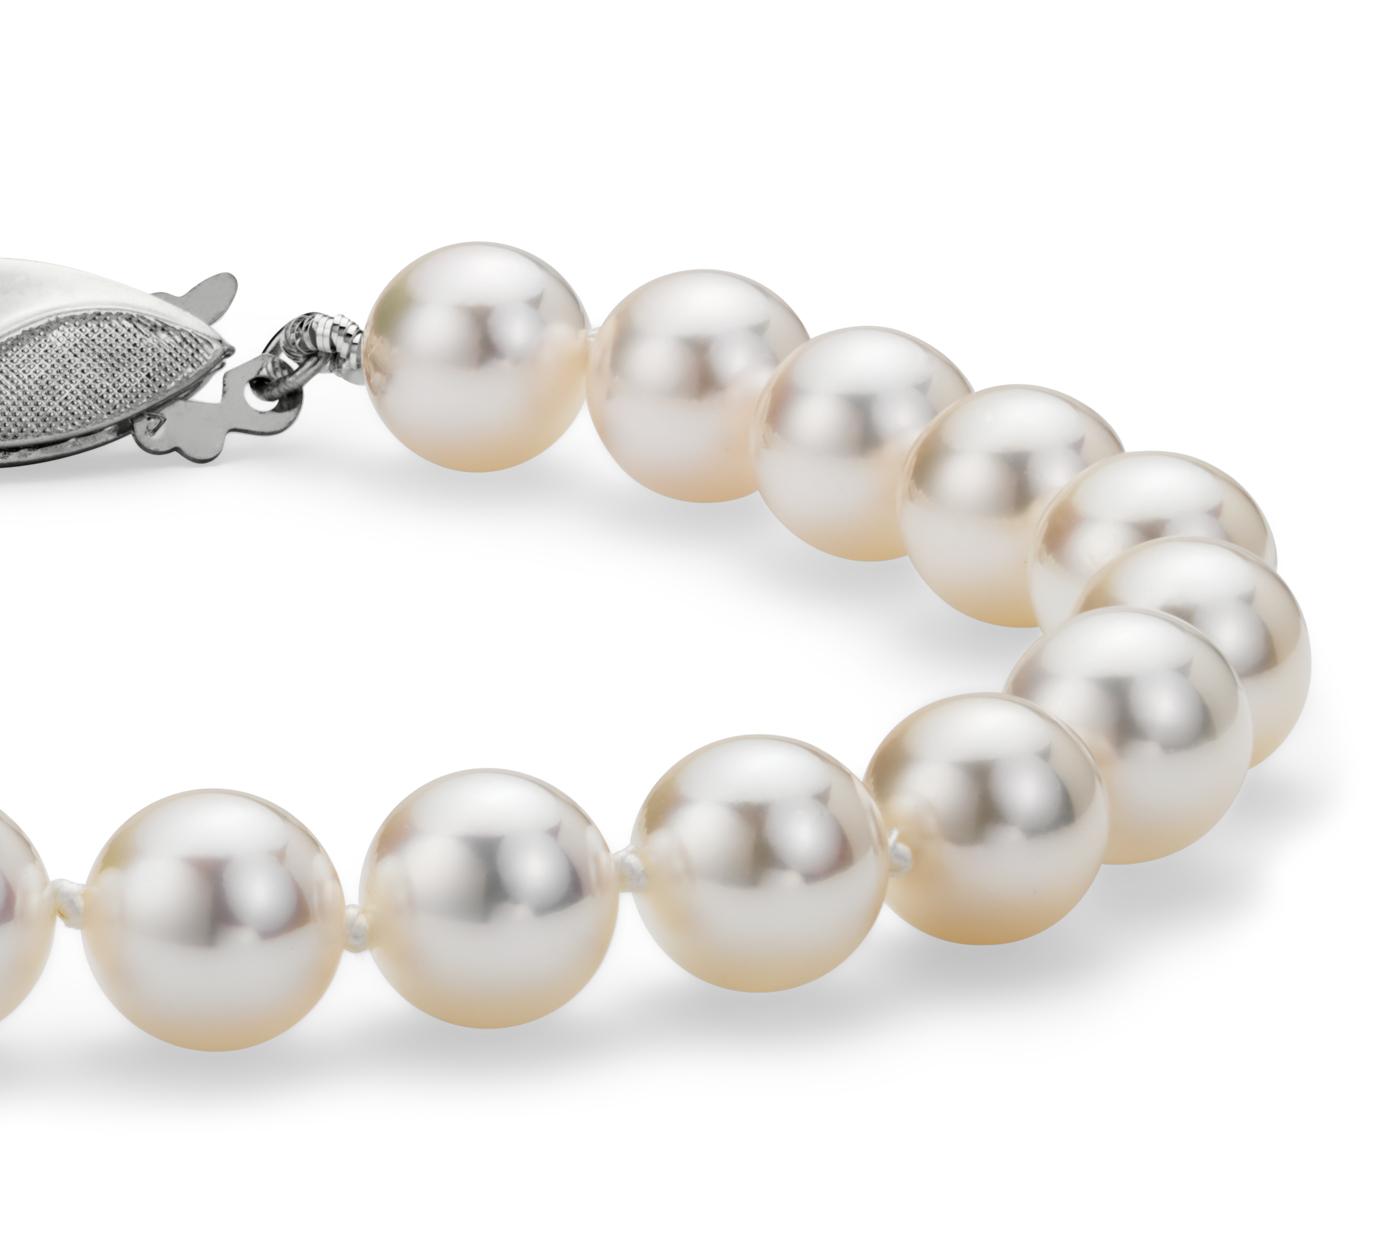 Bracelet de perles de culture d'Akoya classique avec or blanc 18carats (6,5-7,0mm)